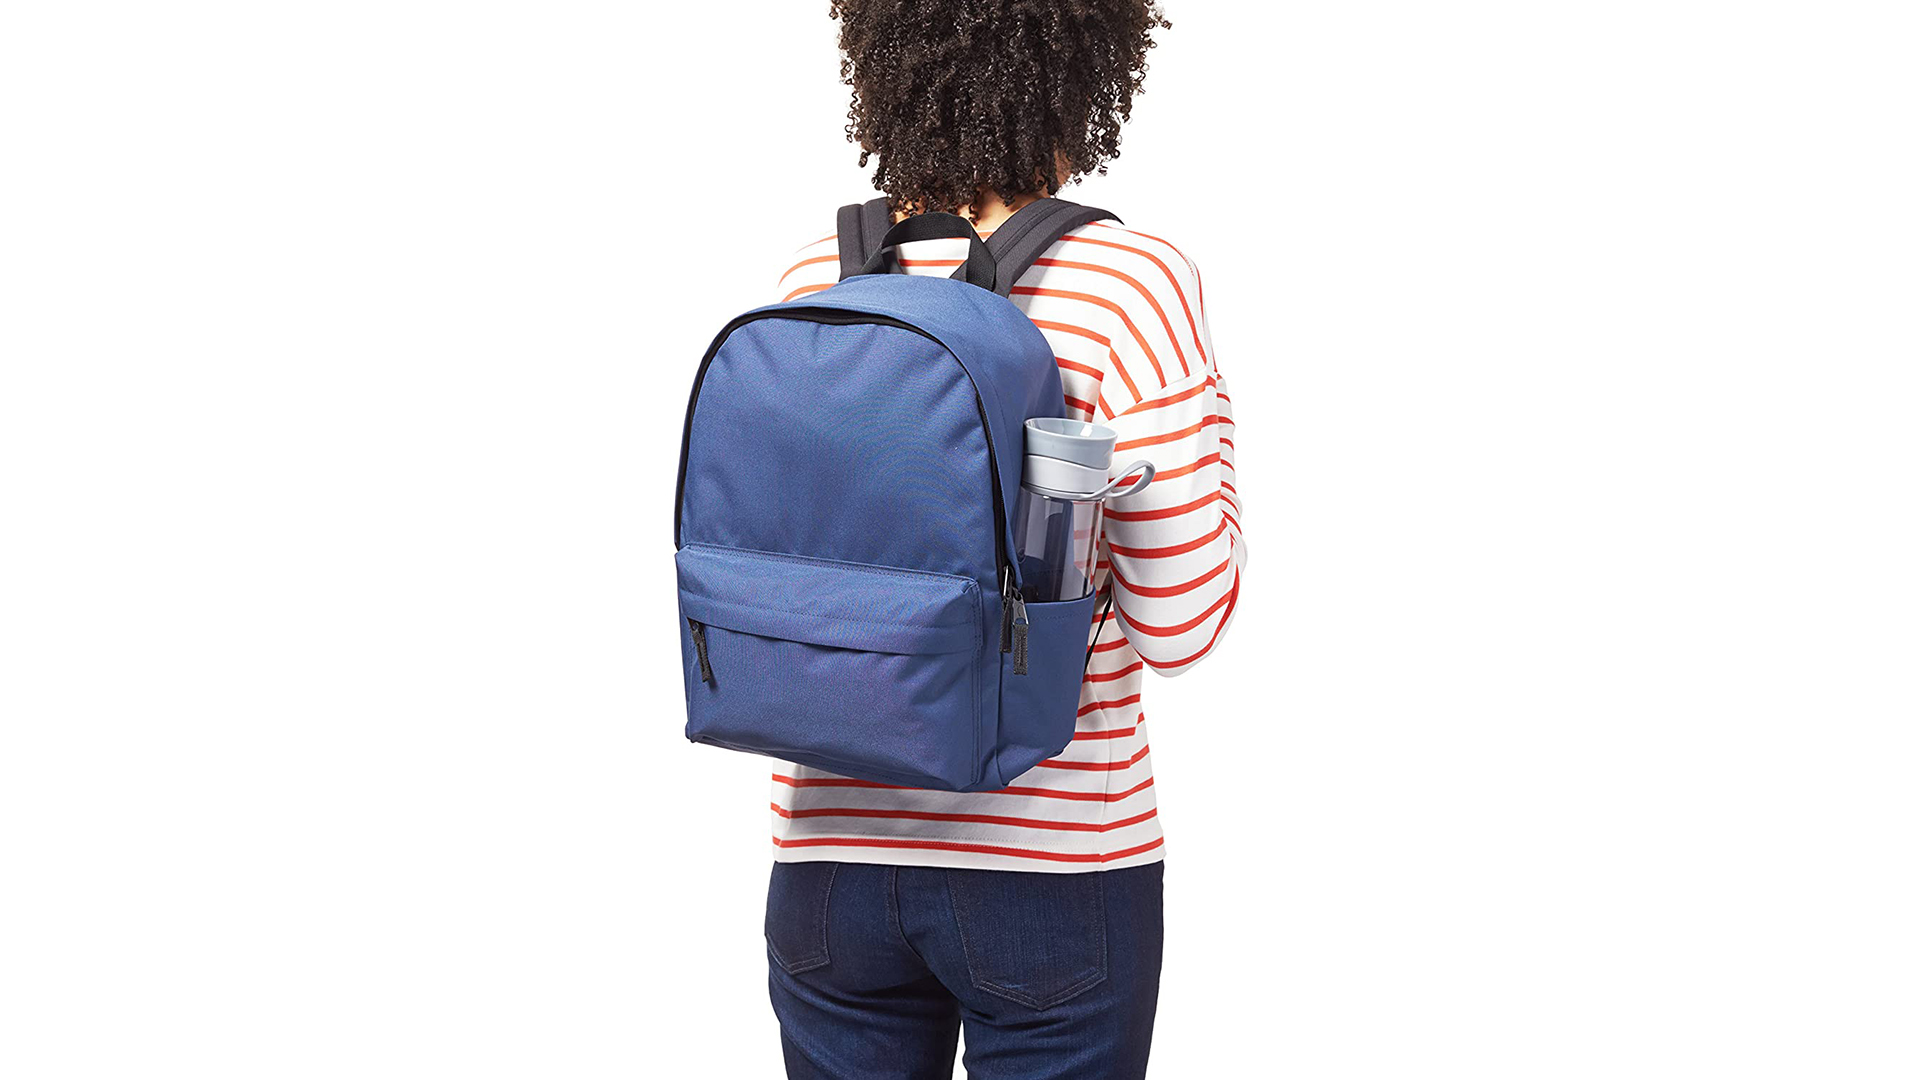 Backpack Arizona Ice Tea Laptop Backpack Fashion Theme School Backpack